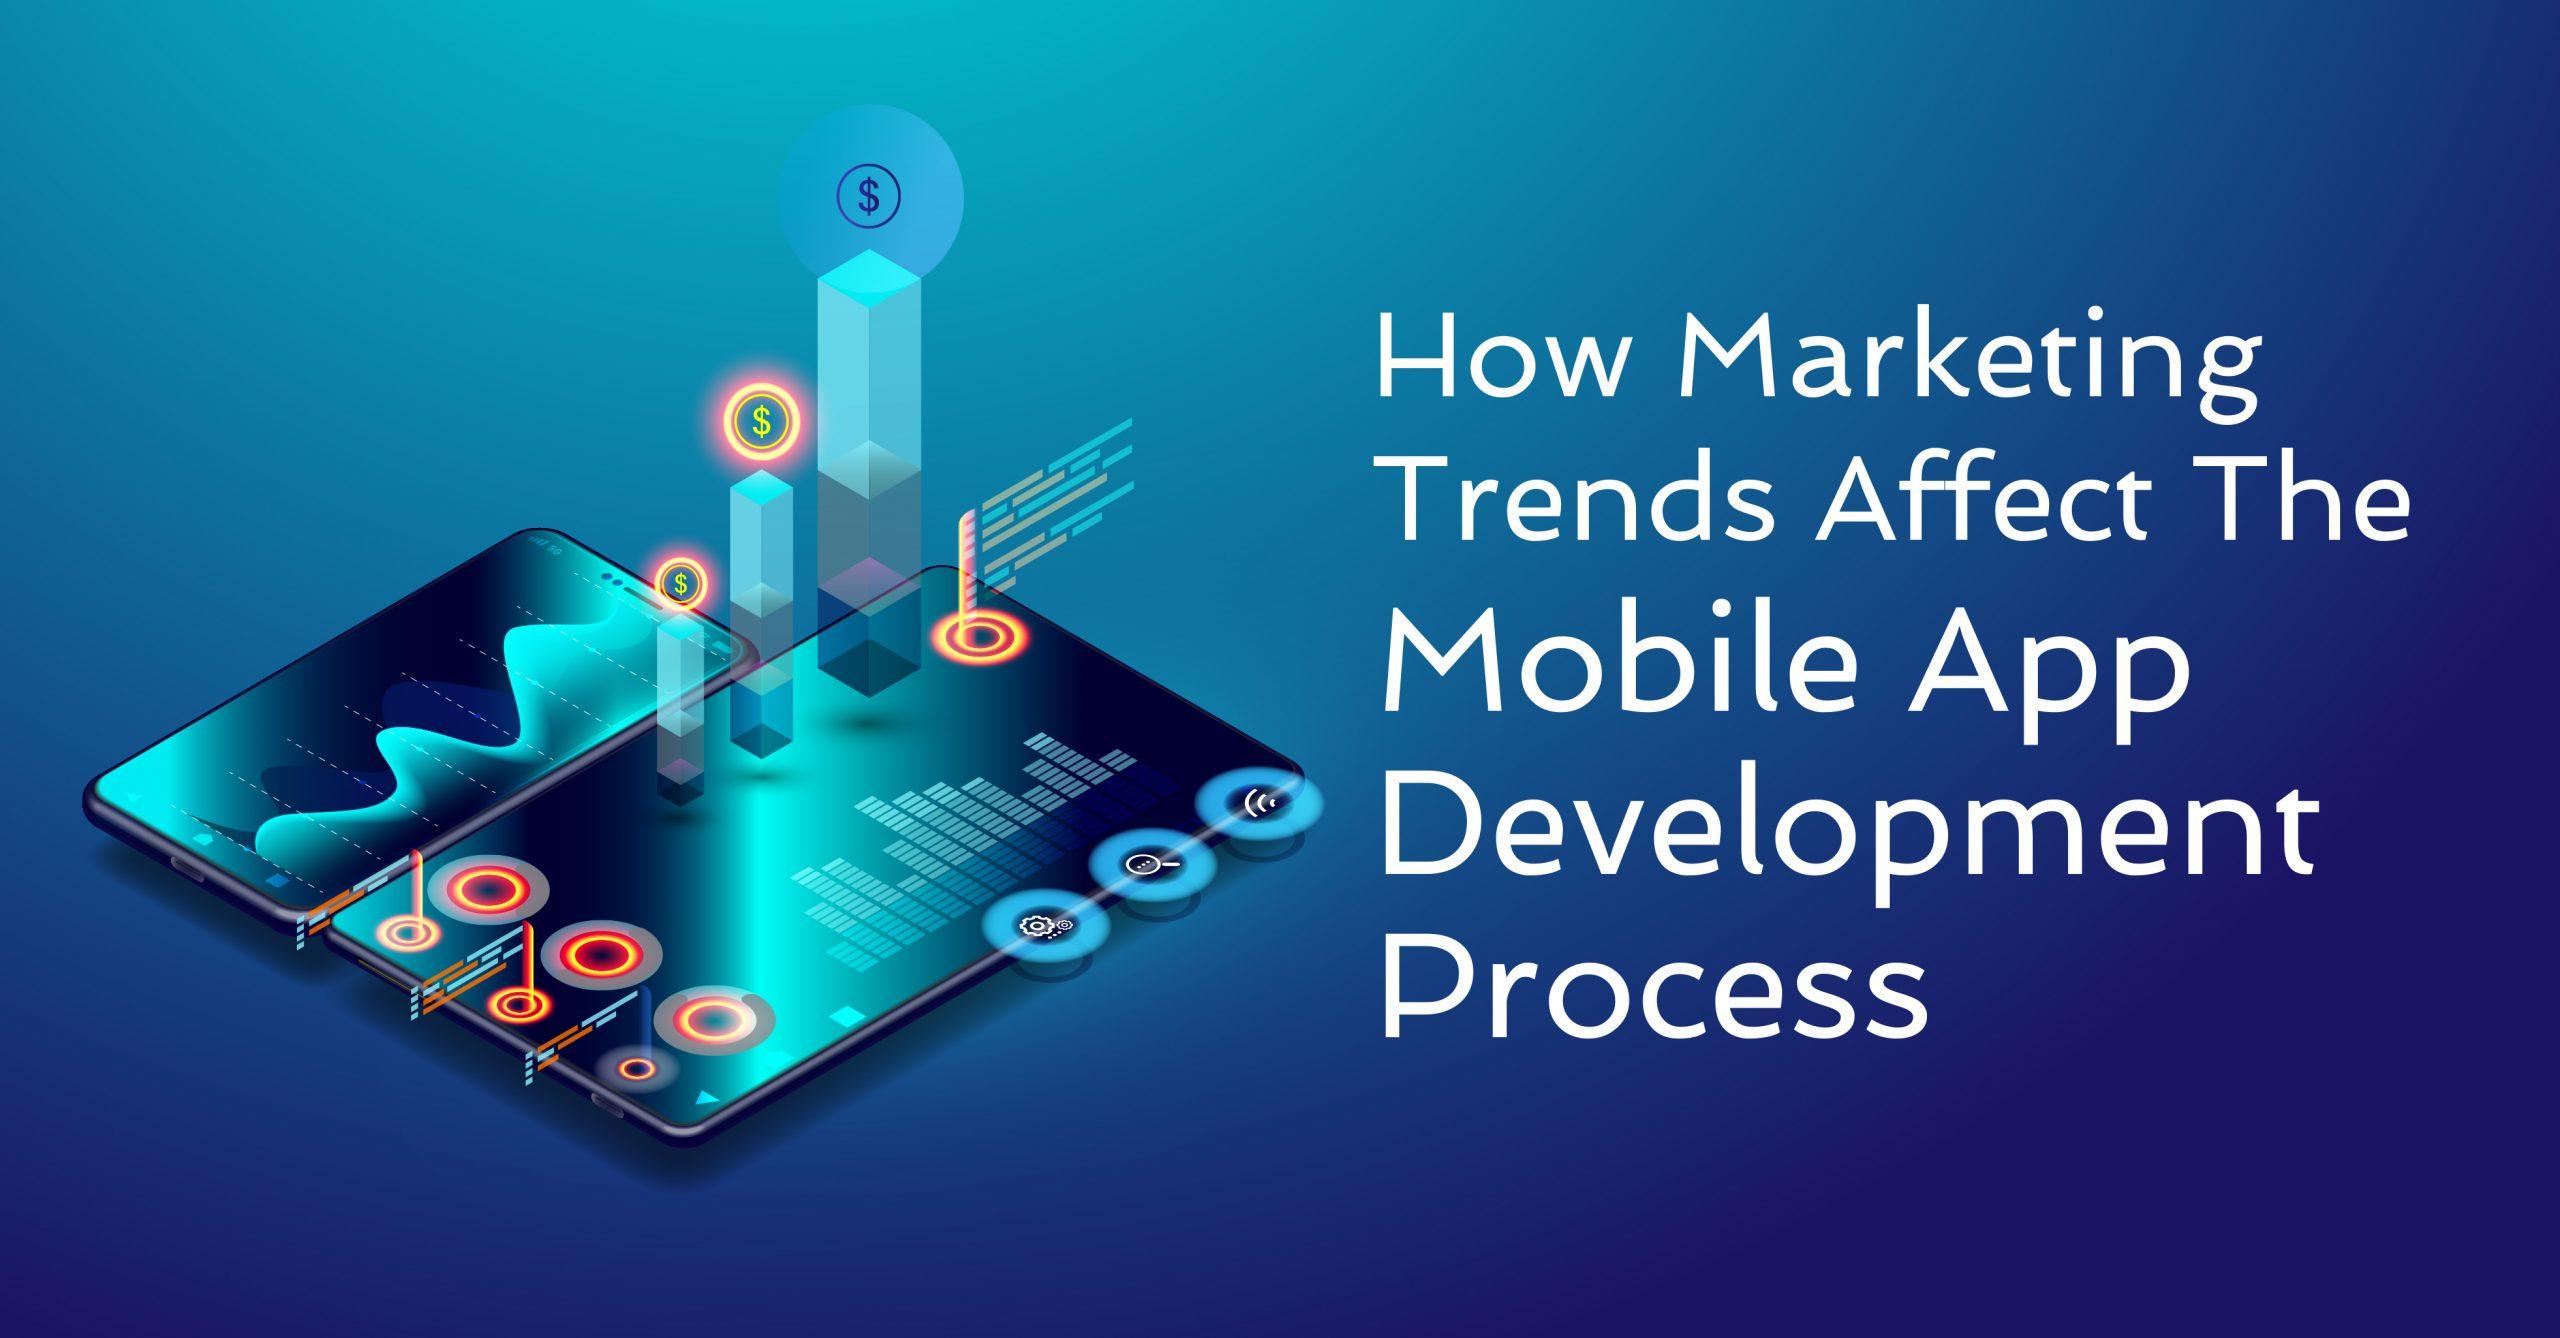 how-marketing-trends-affect-the-mobile-app-development-process